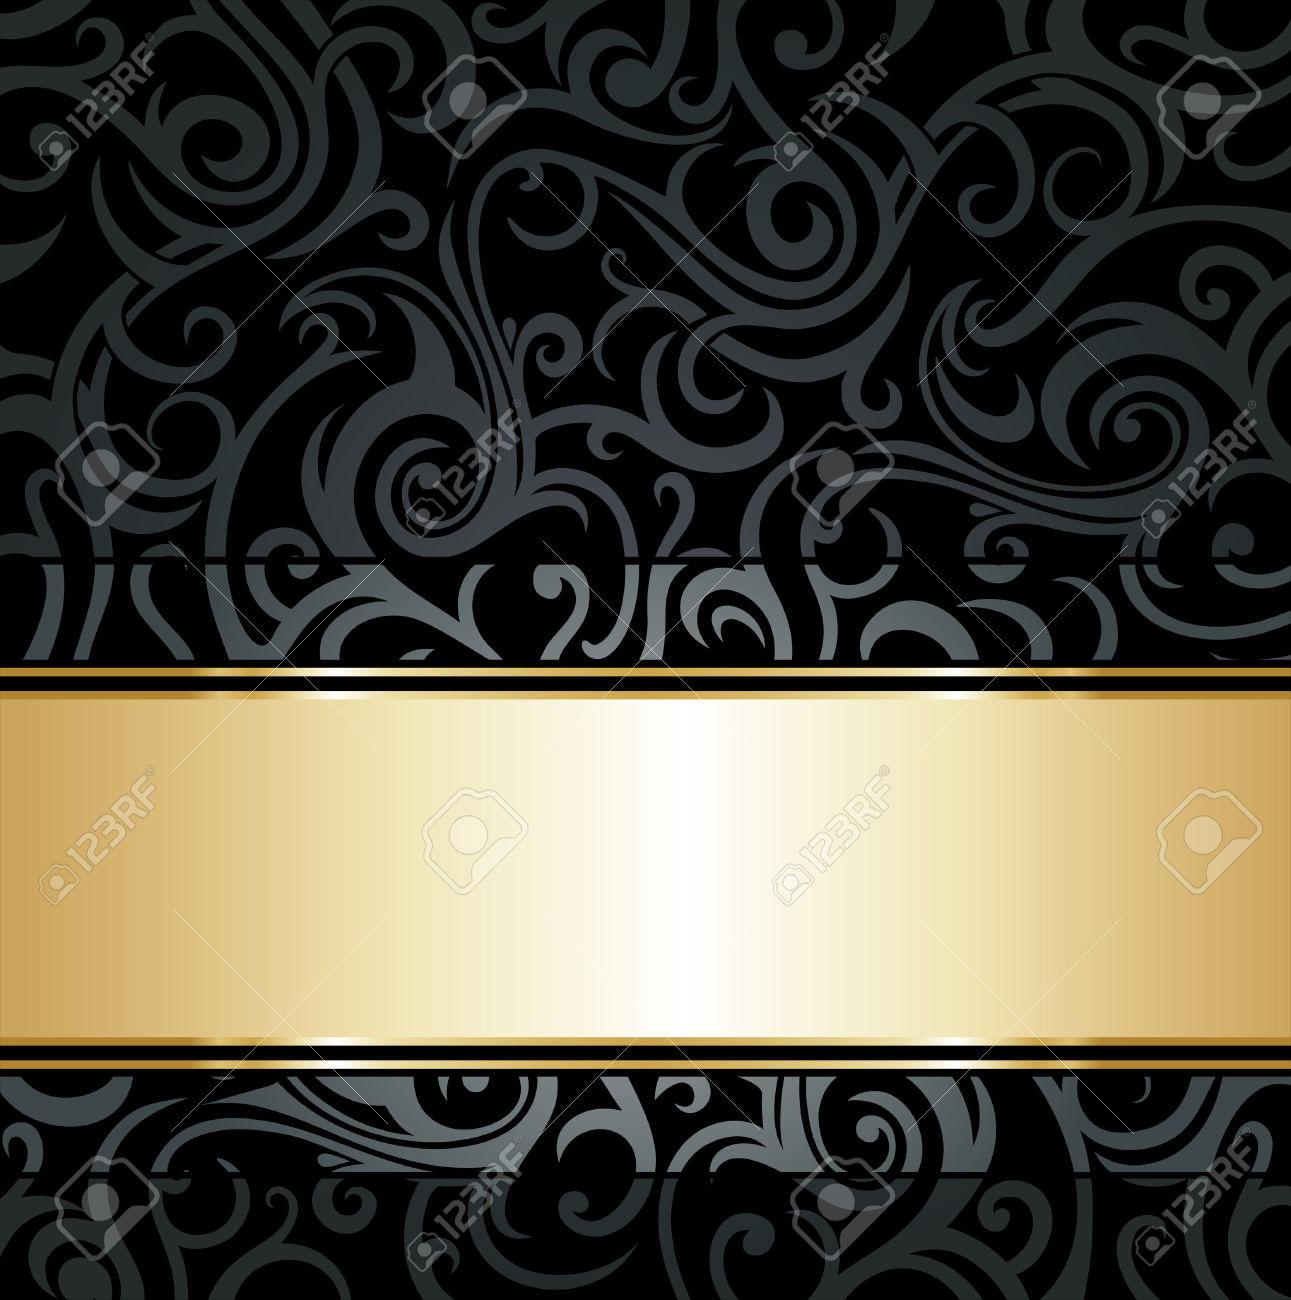 Black And Gold Vintage Wallpaper WallpaperHDCcom 1291x1300